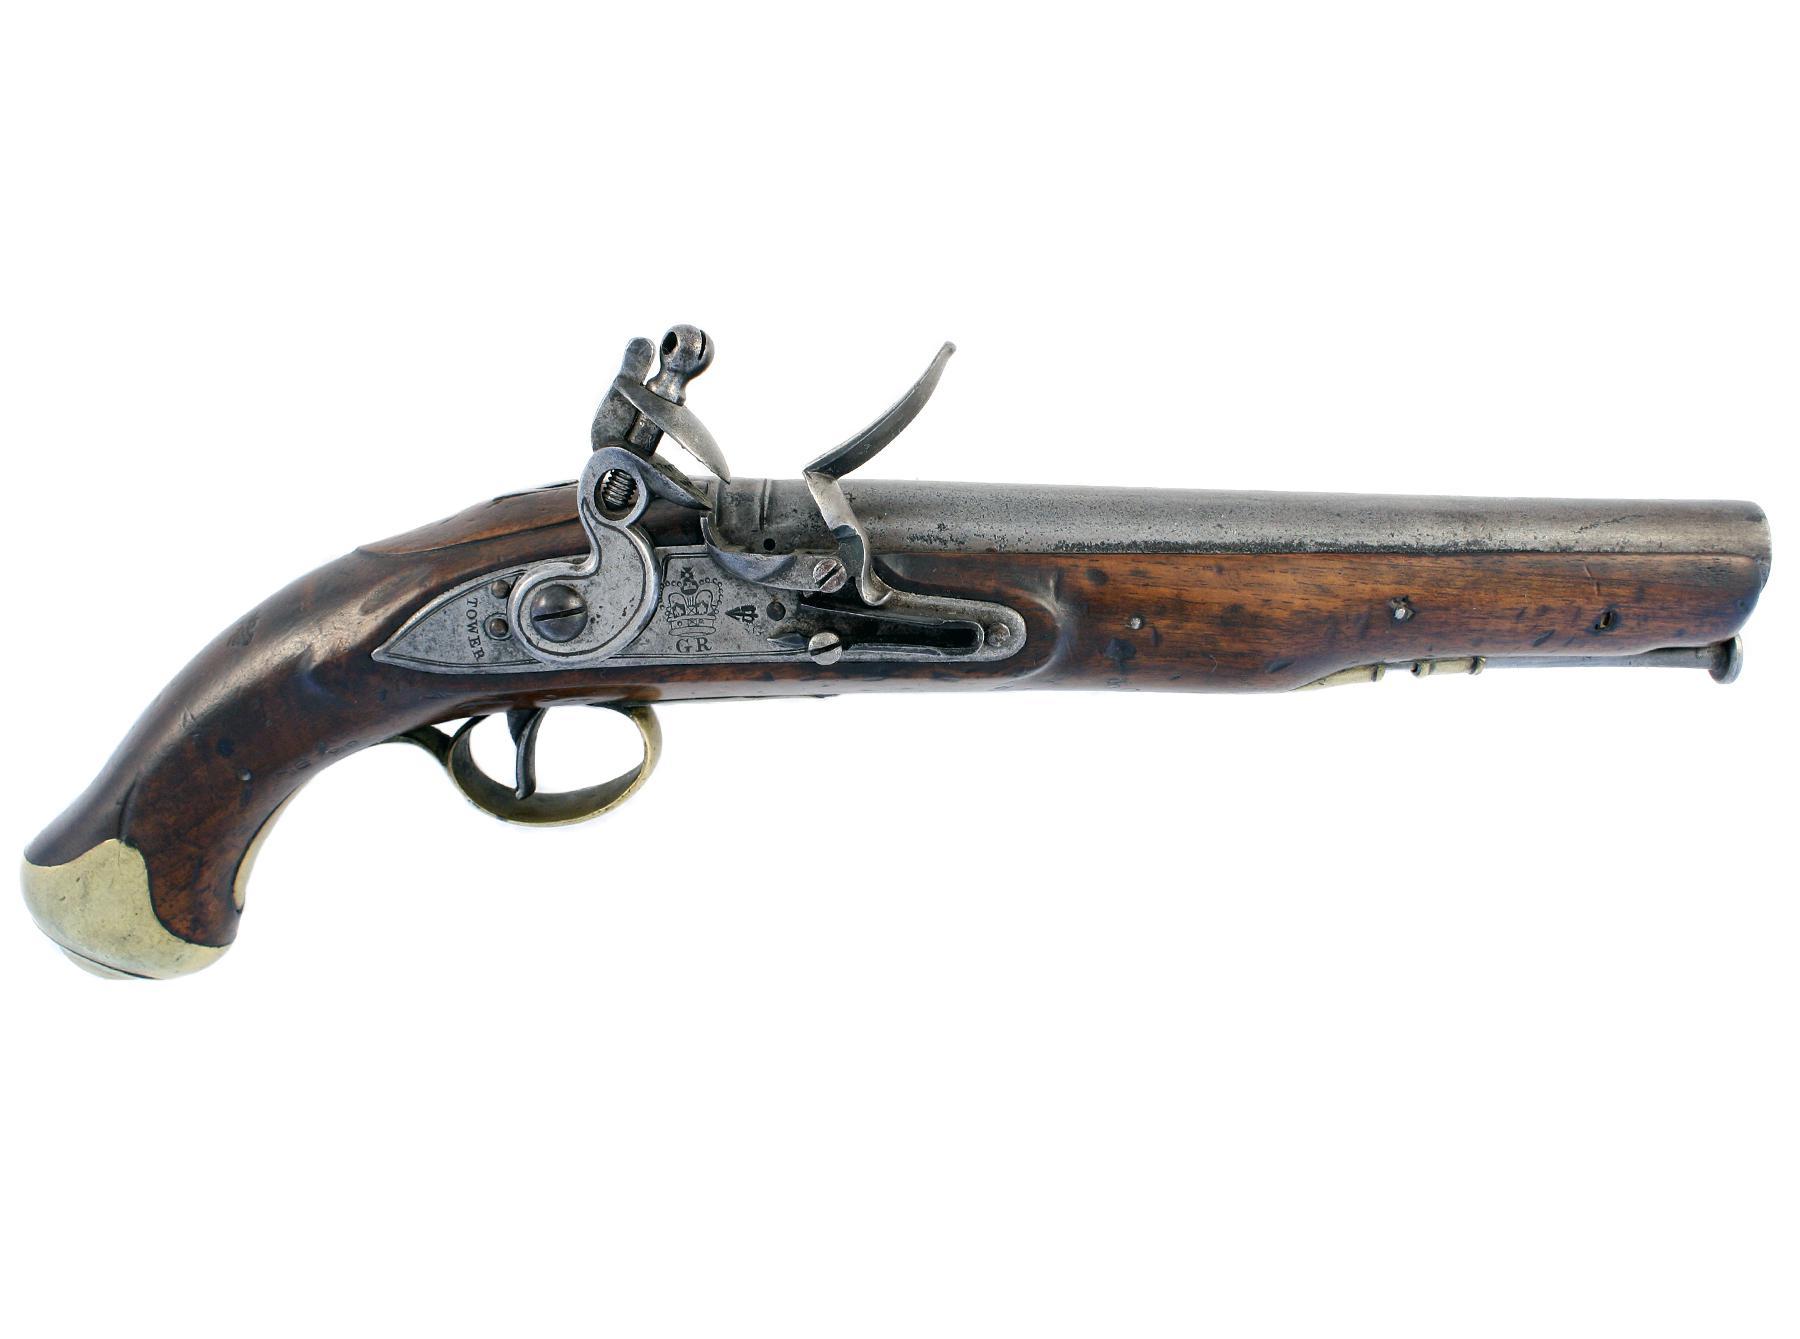 A Light Dragoon Pistol